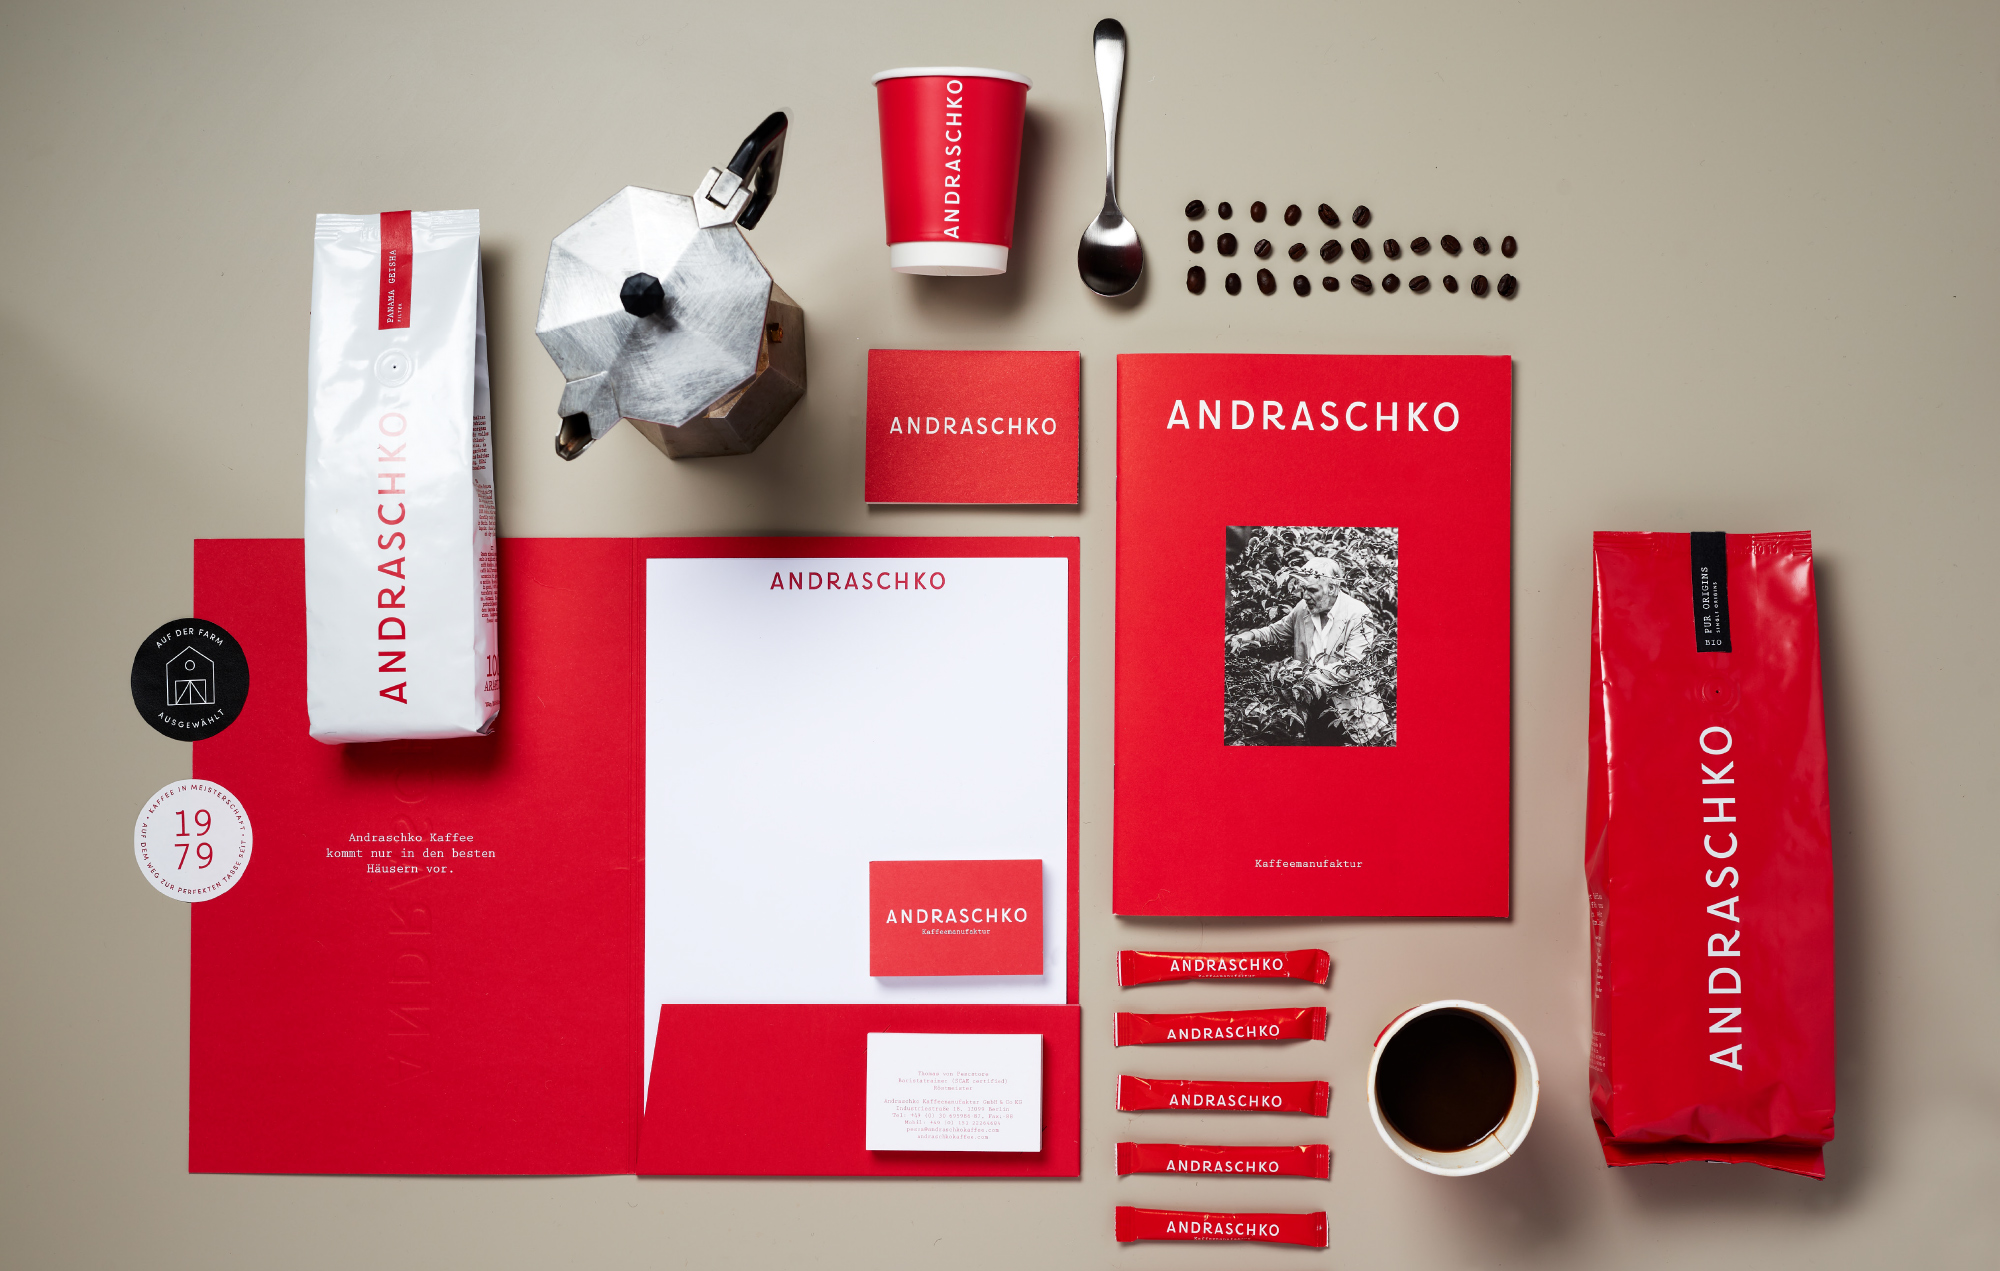 Andraschko Kaffee